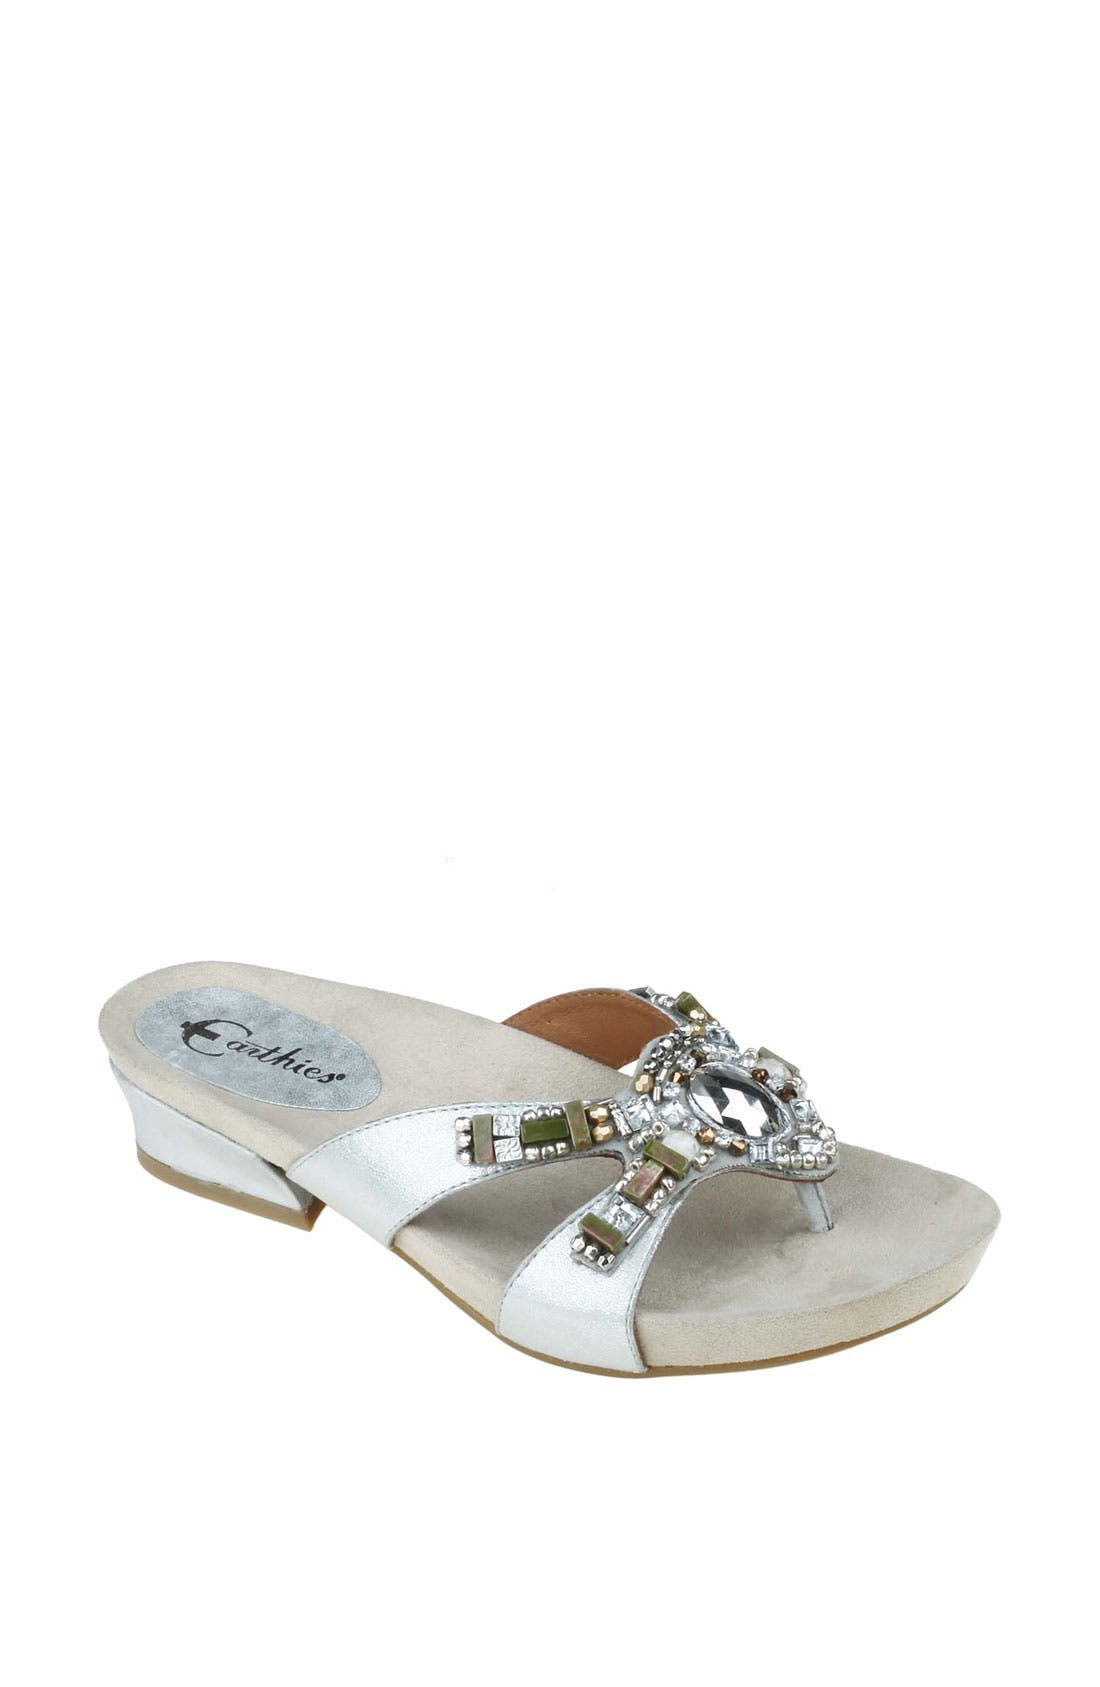 Main Image - Earthies® 'La Zeretta' Sandal